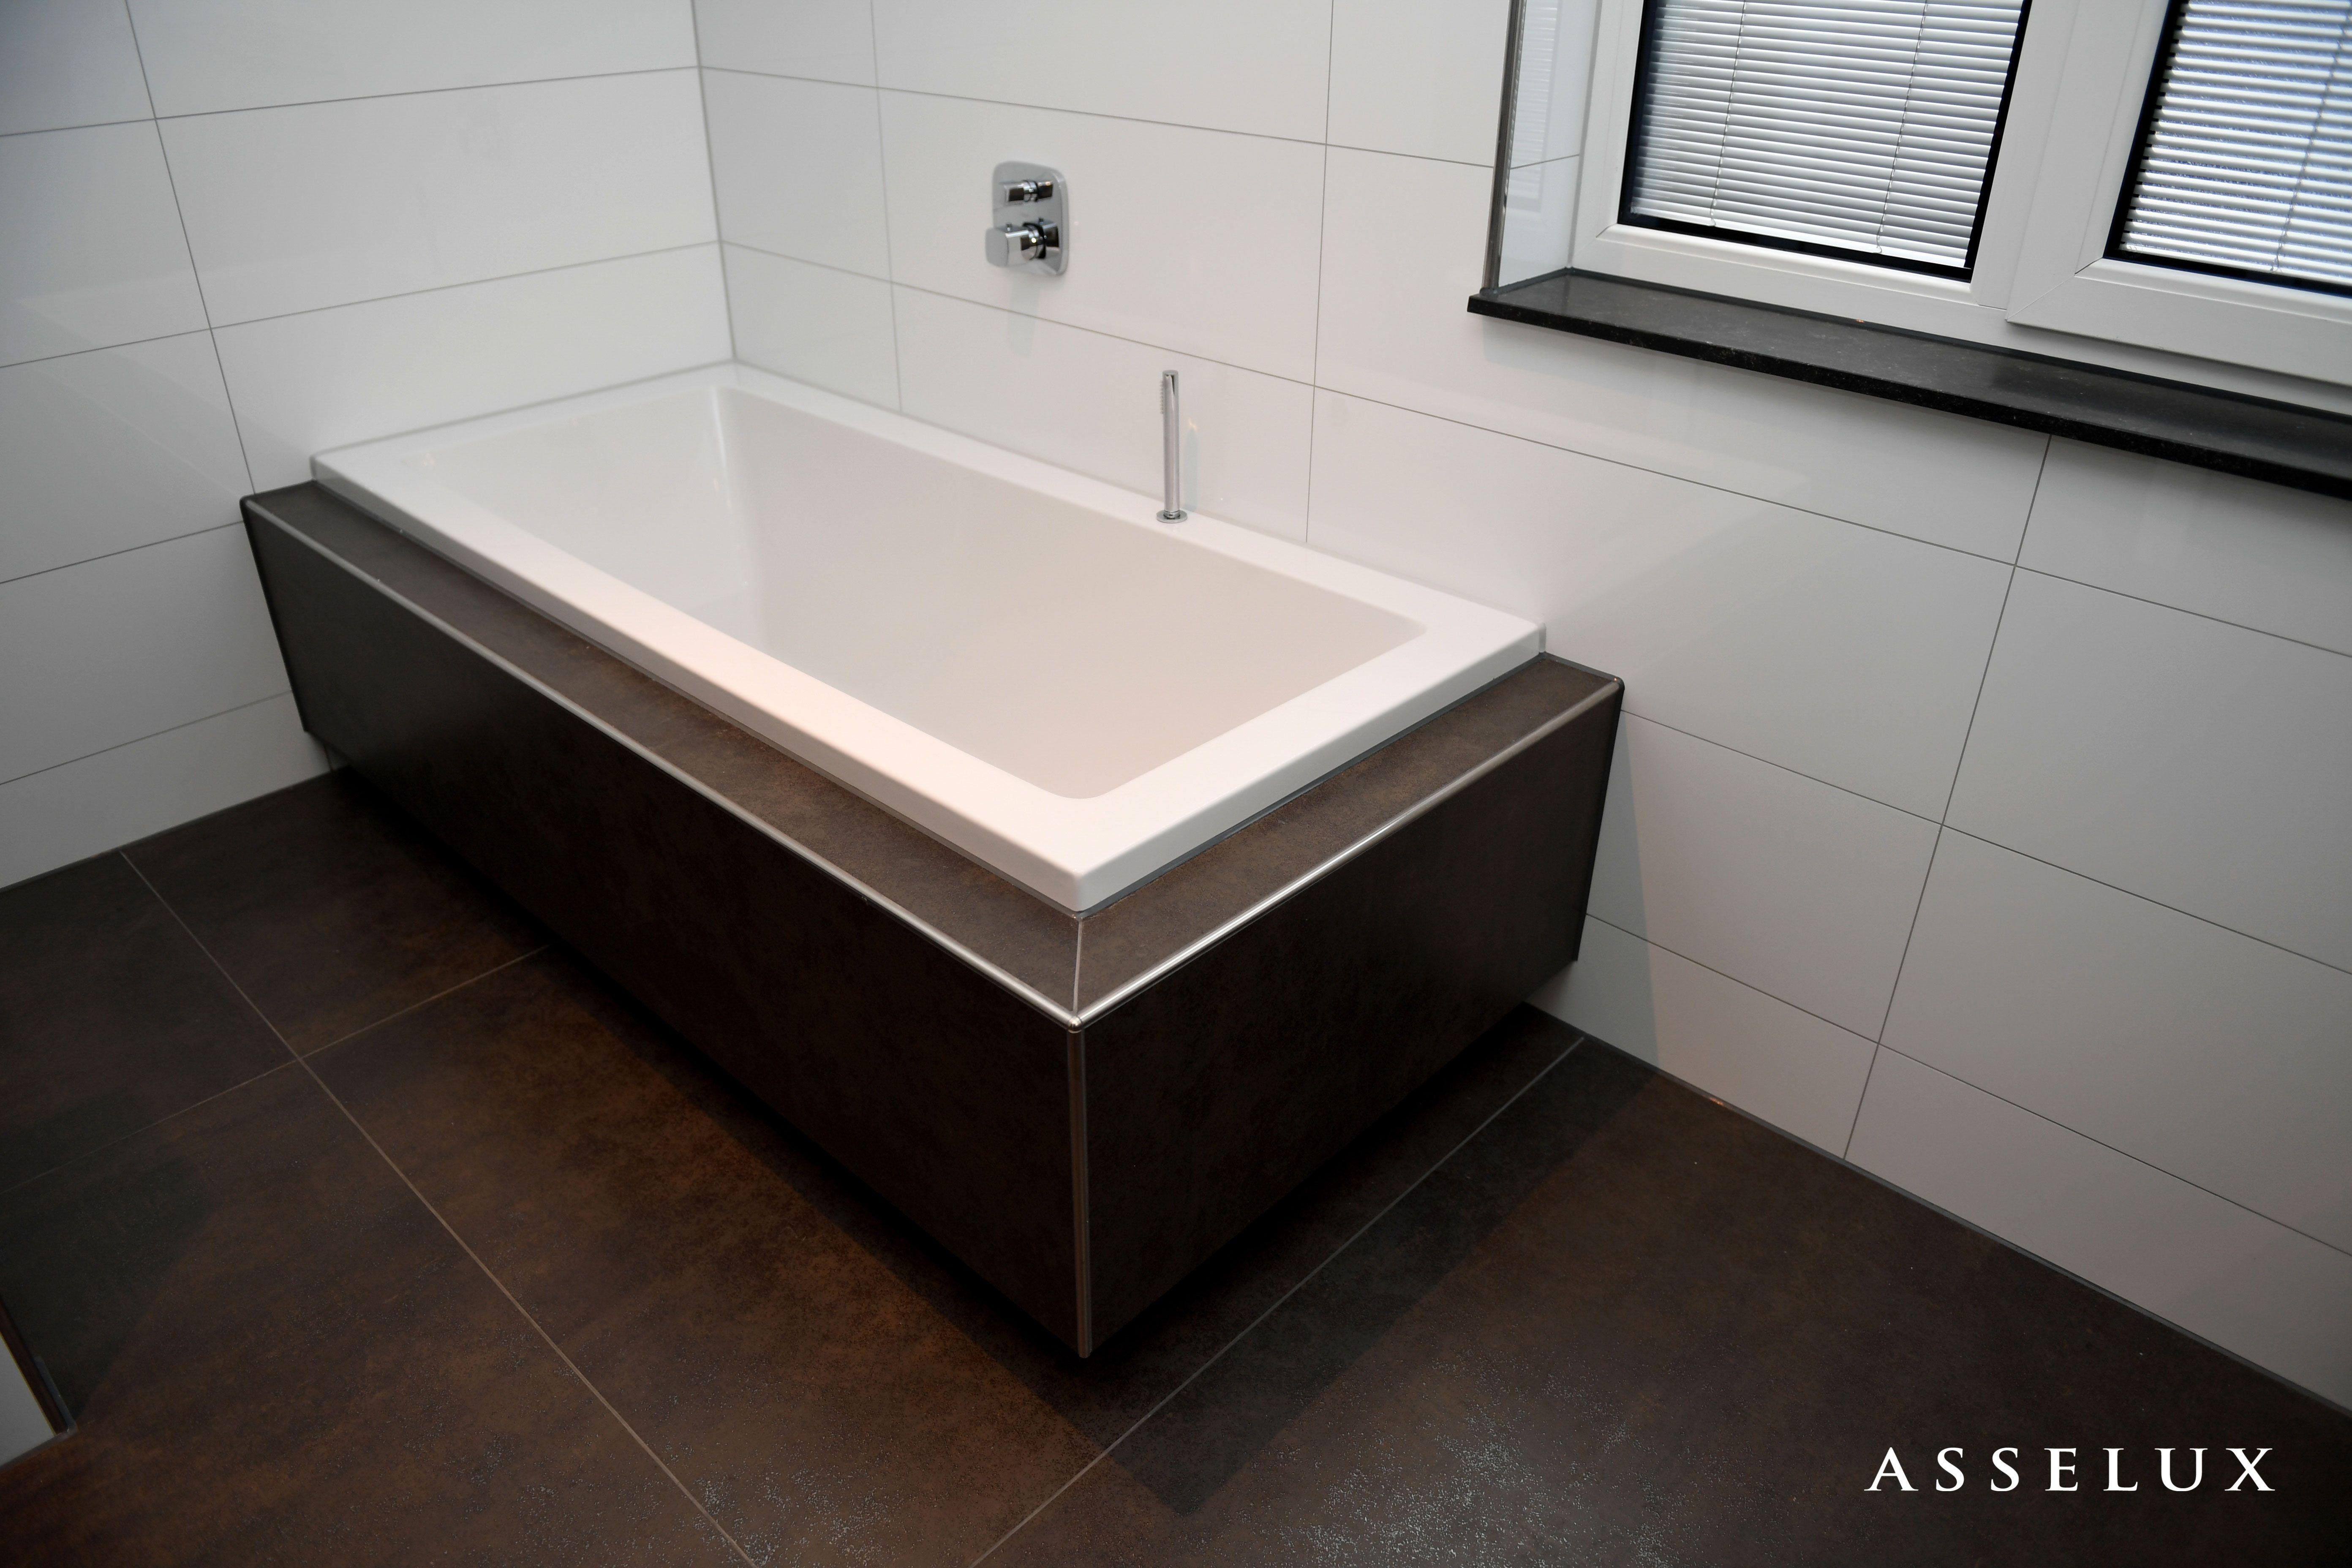 Asselux badkamer | Badombouw | Vloeren | Keramiek | A S S E L U X ...